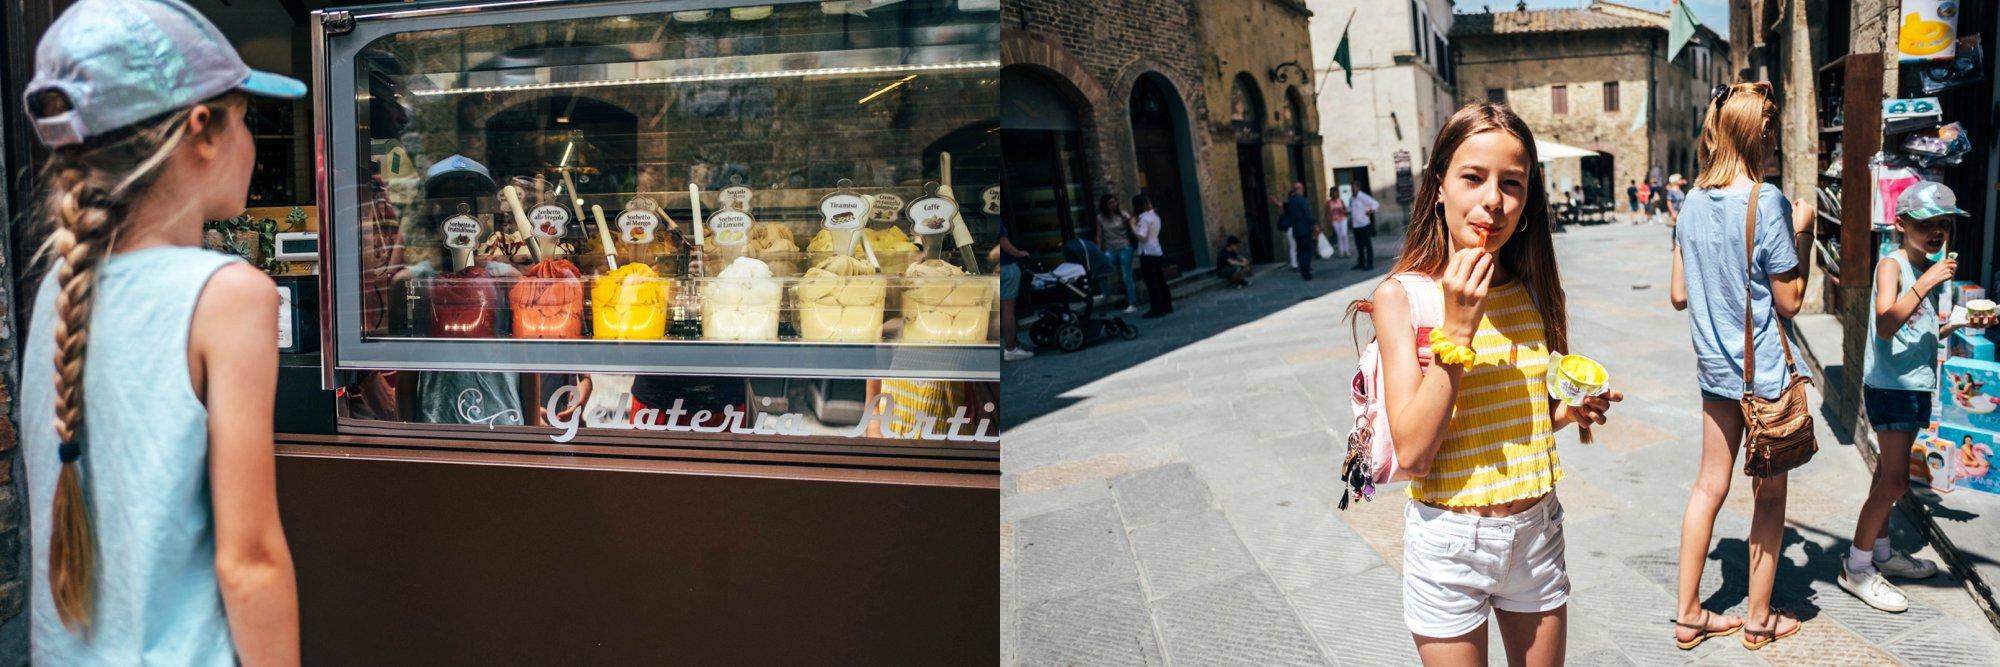 Girls eating ice cream at St Gimignano Tuscany Essex Documentary Travel Wedding Photographer